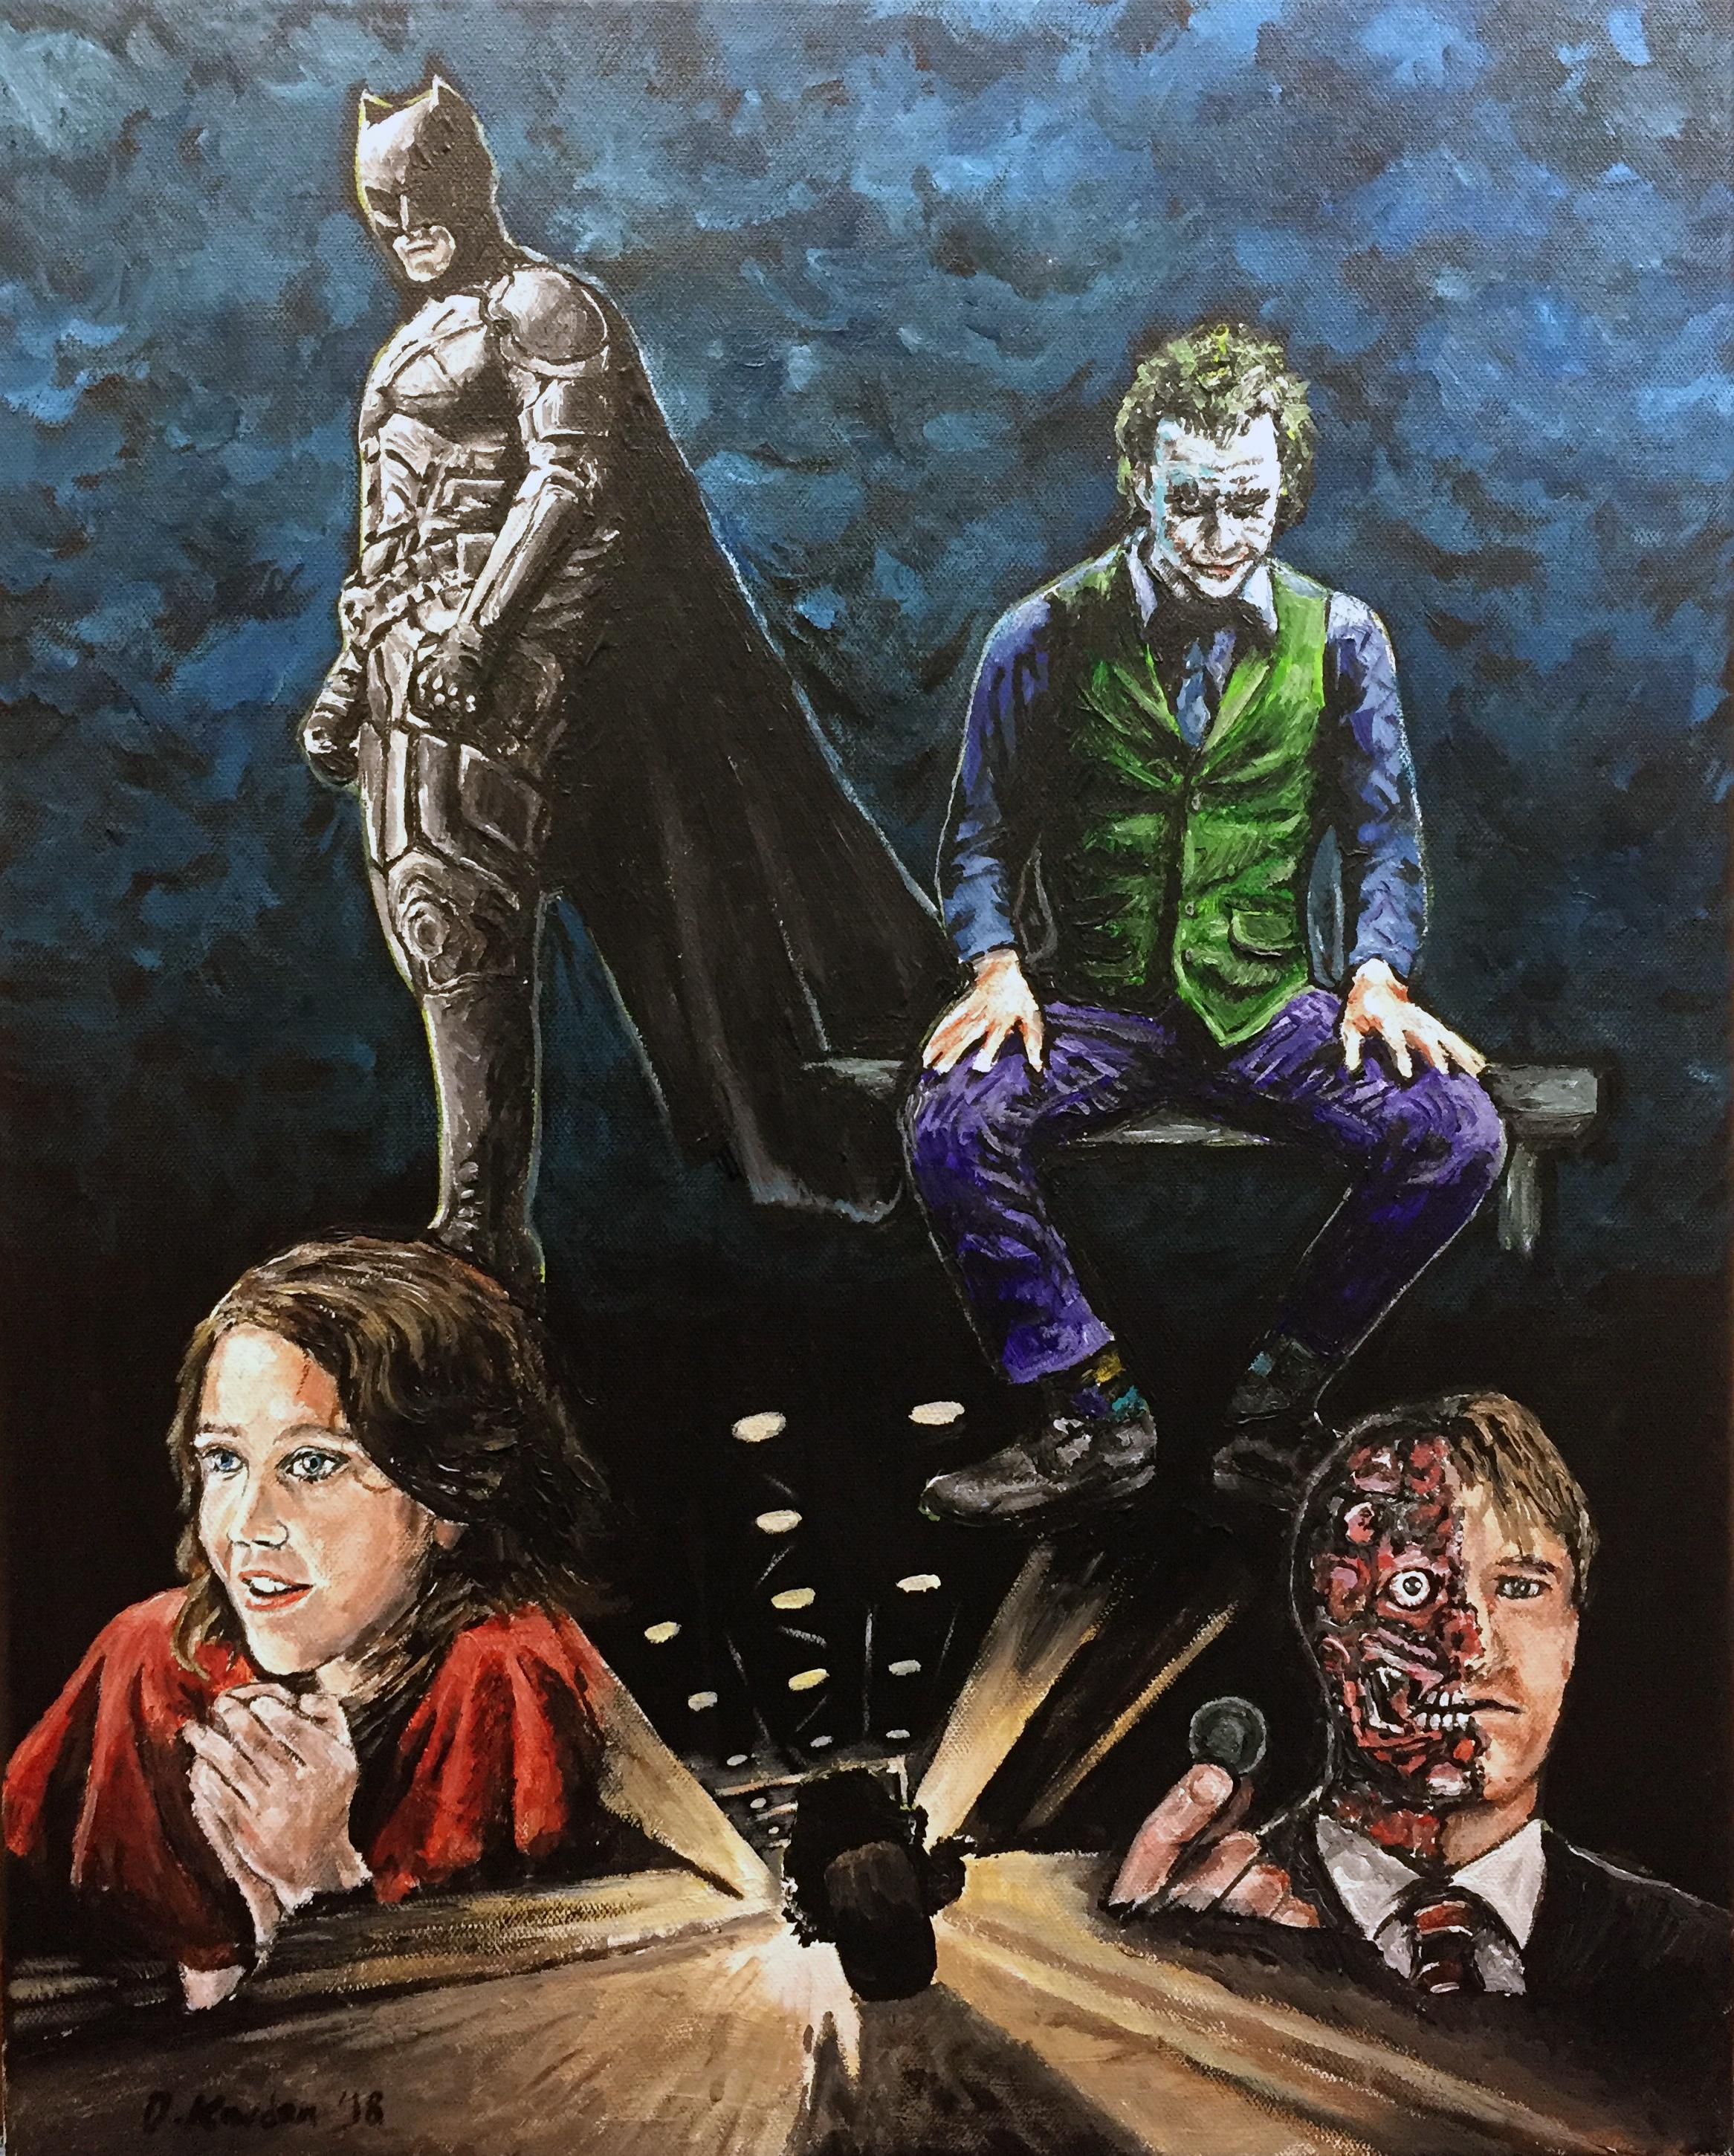 The Dark Knight- Painting by Damon Kardon-2018